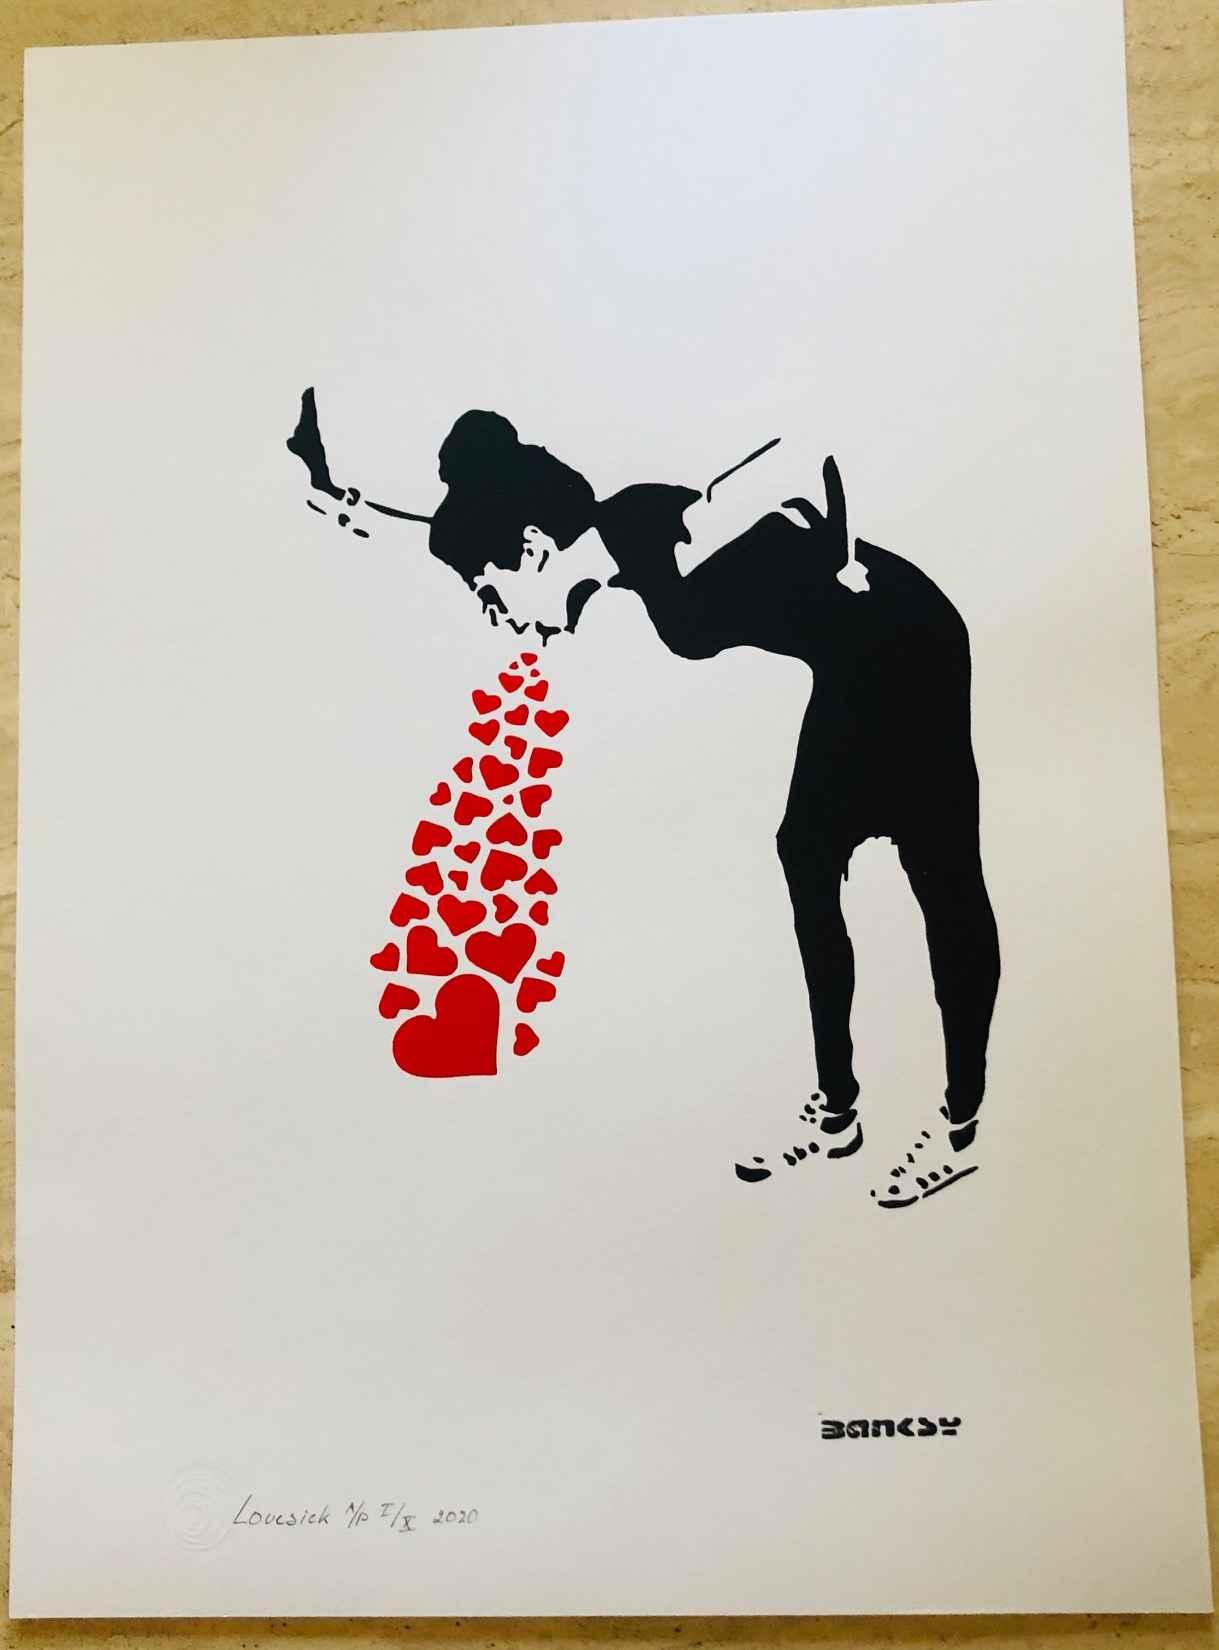 Love Sick by   Banksy - Masterpiece Online